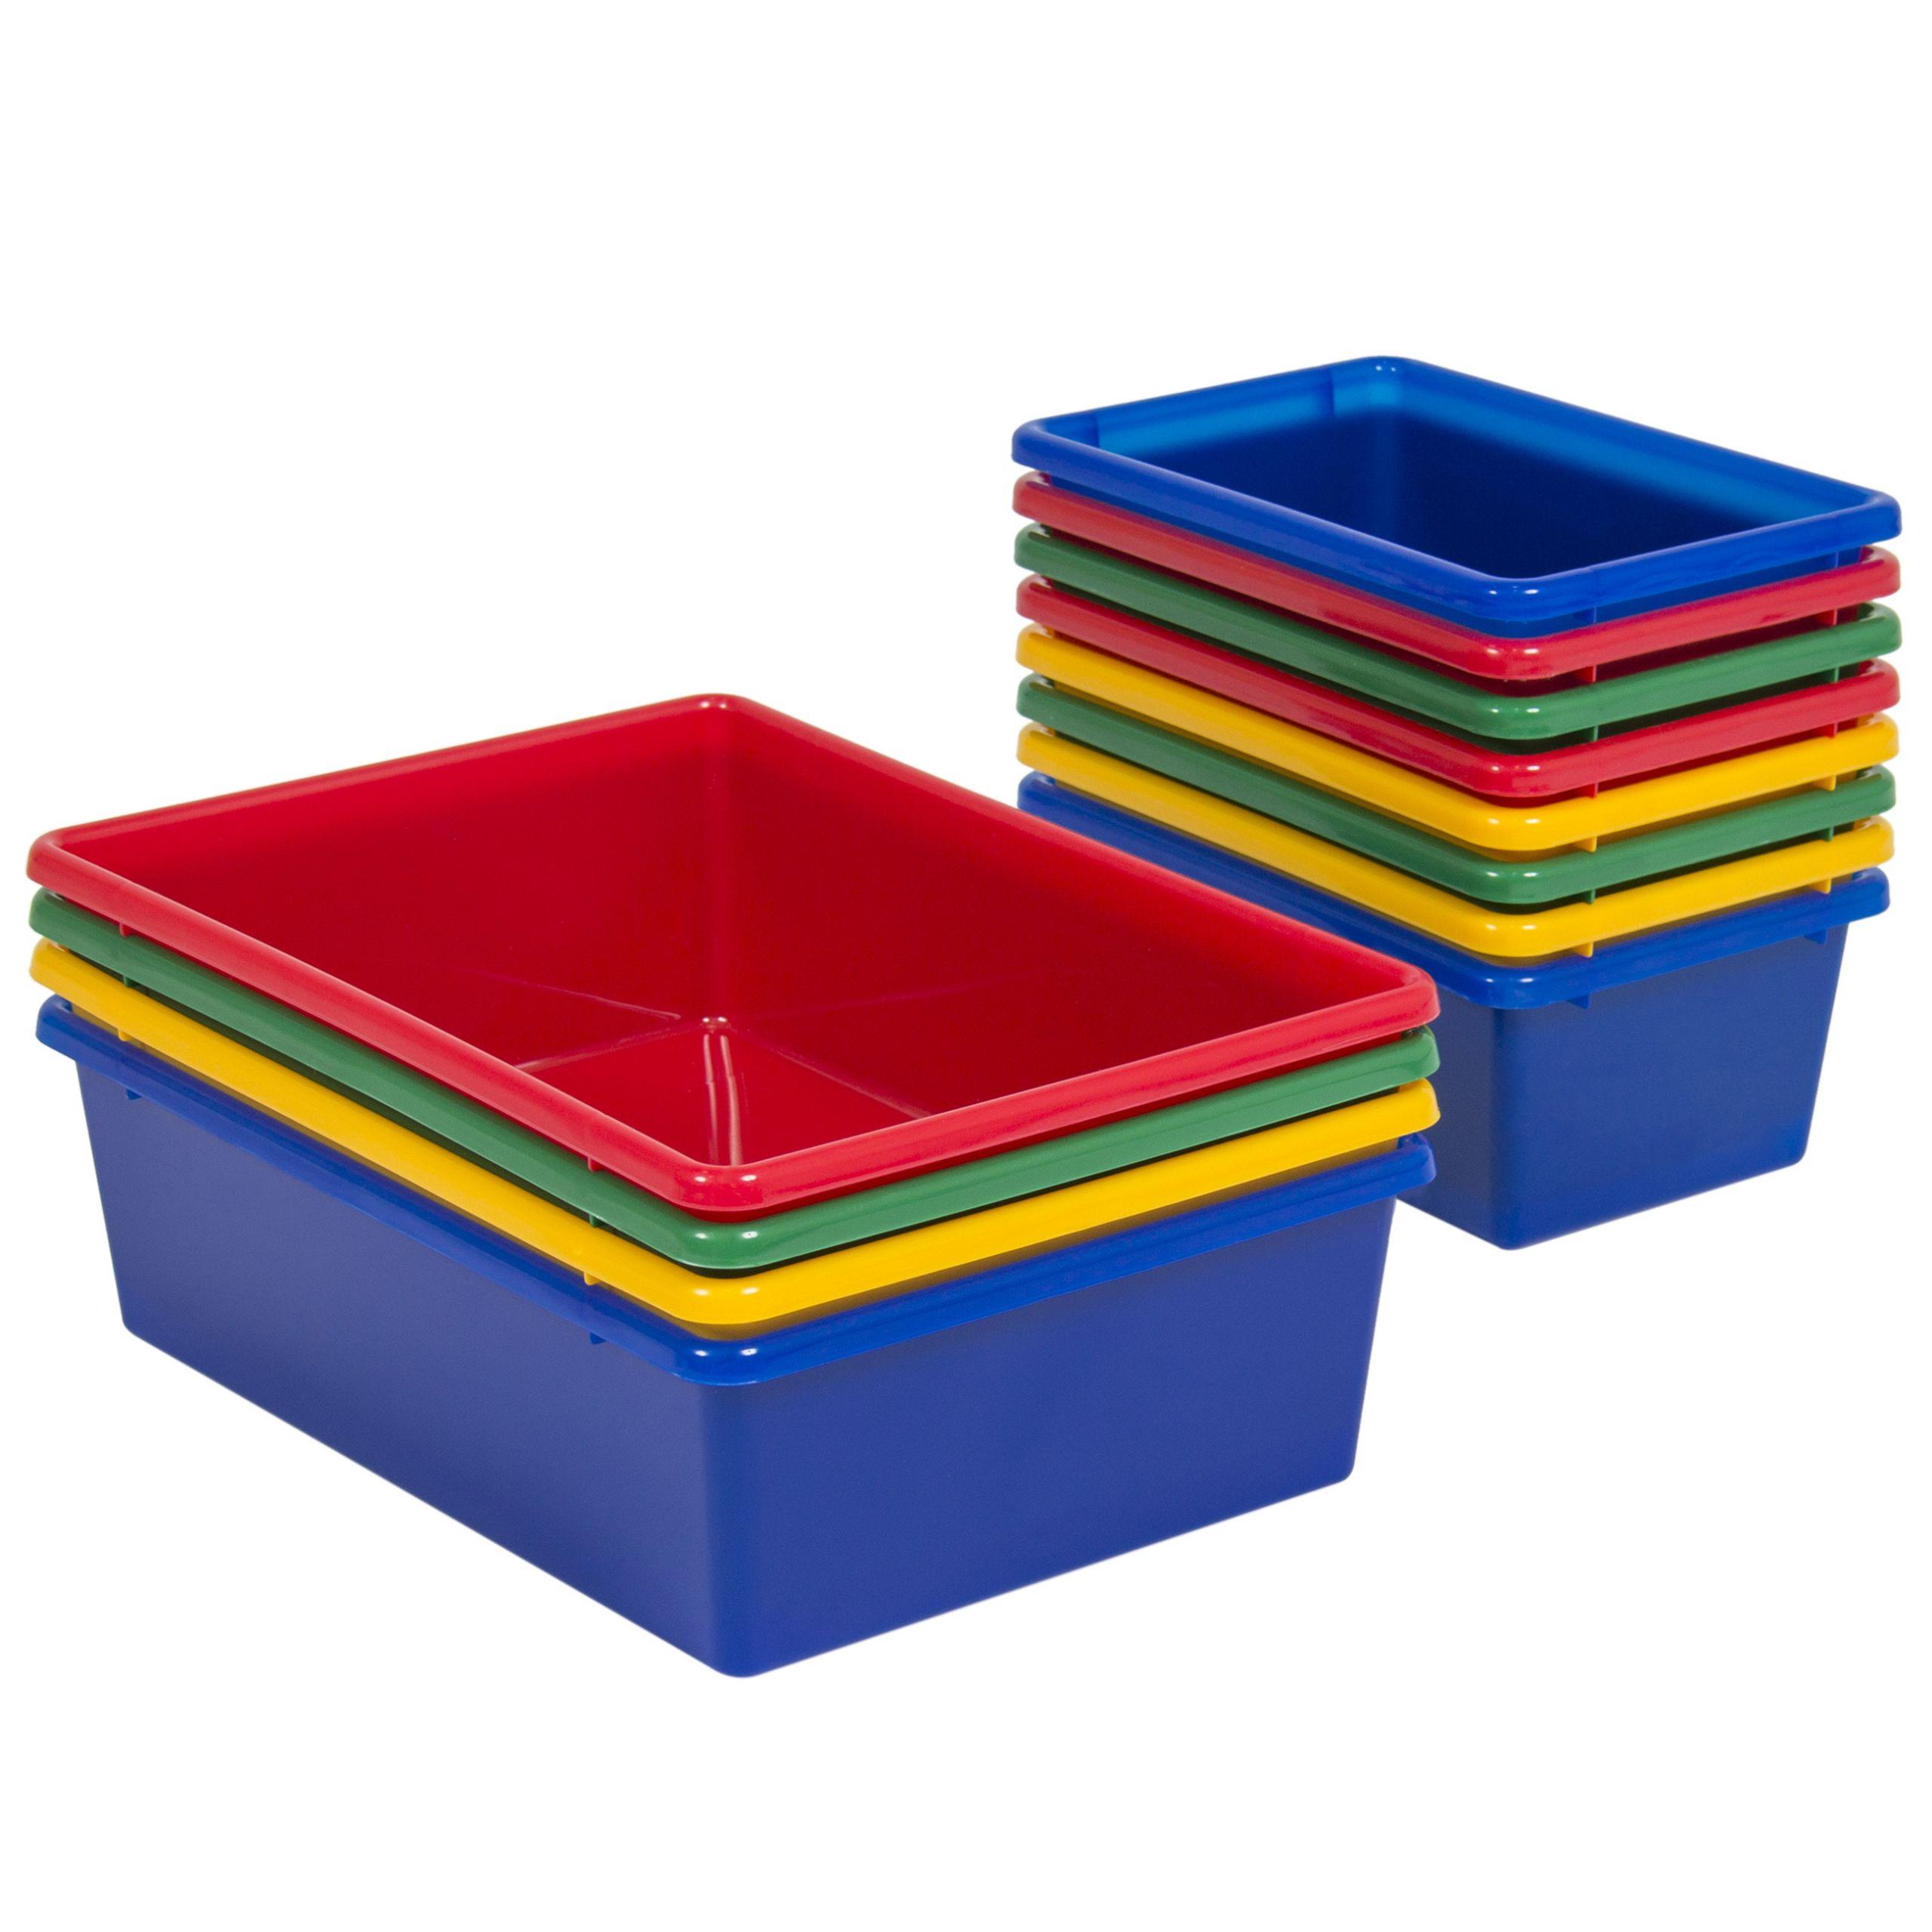 Bedroom Storage Bins  Toy Bin Organizer Kids Childrens Storage Box Playroom